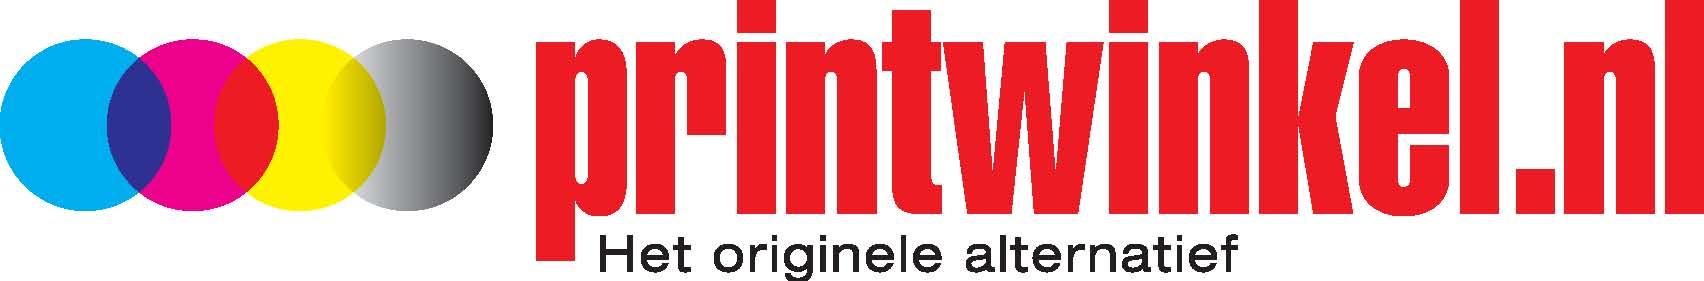 Kortingscode Printwinkel